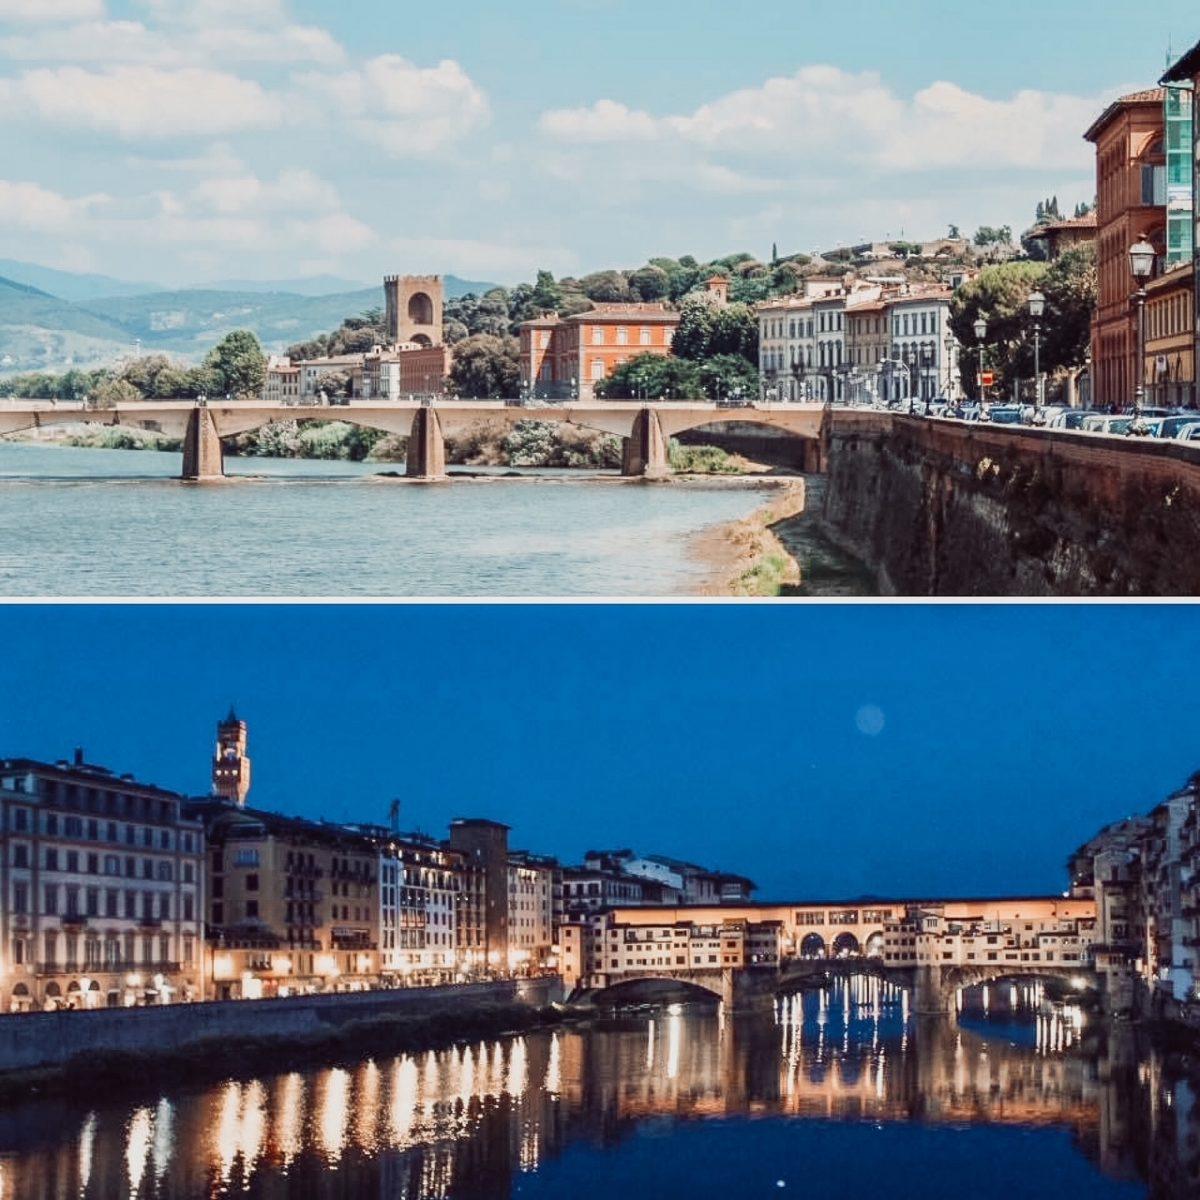 Bridges of Florence, Italy